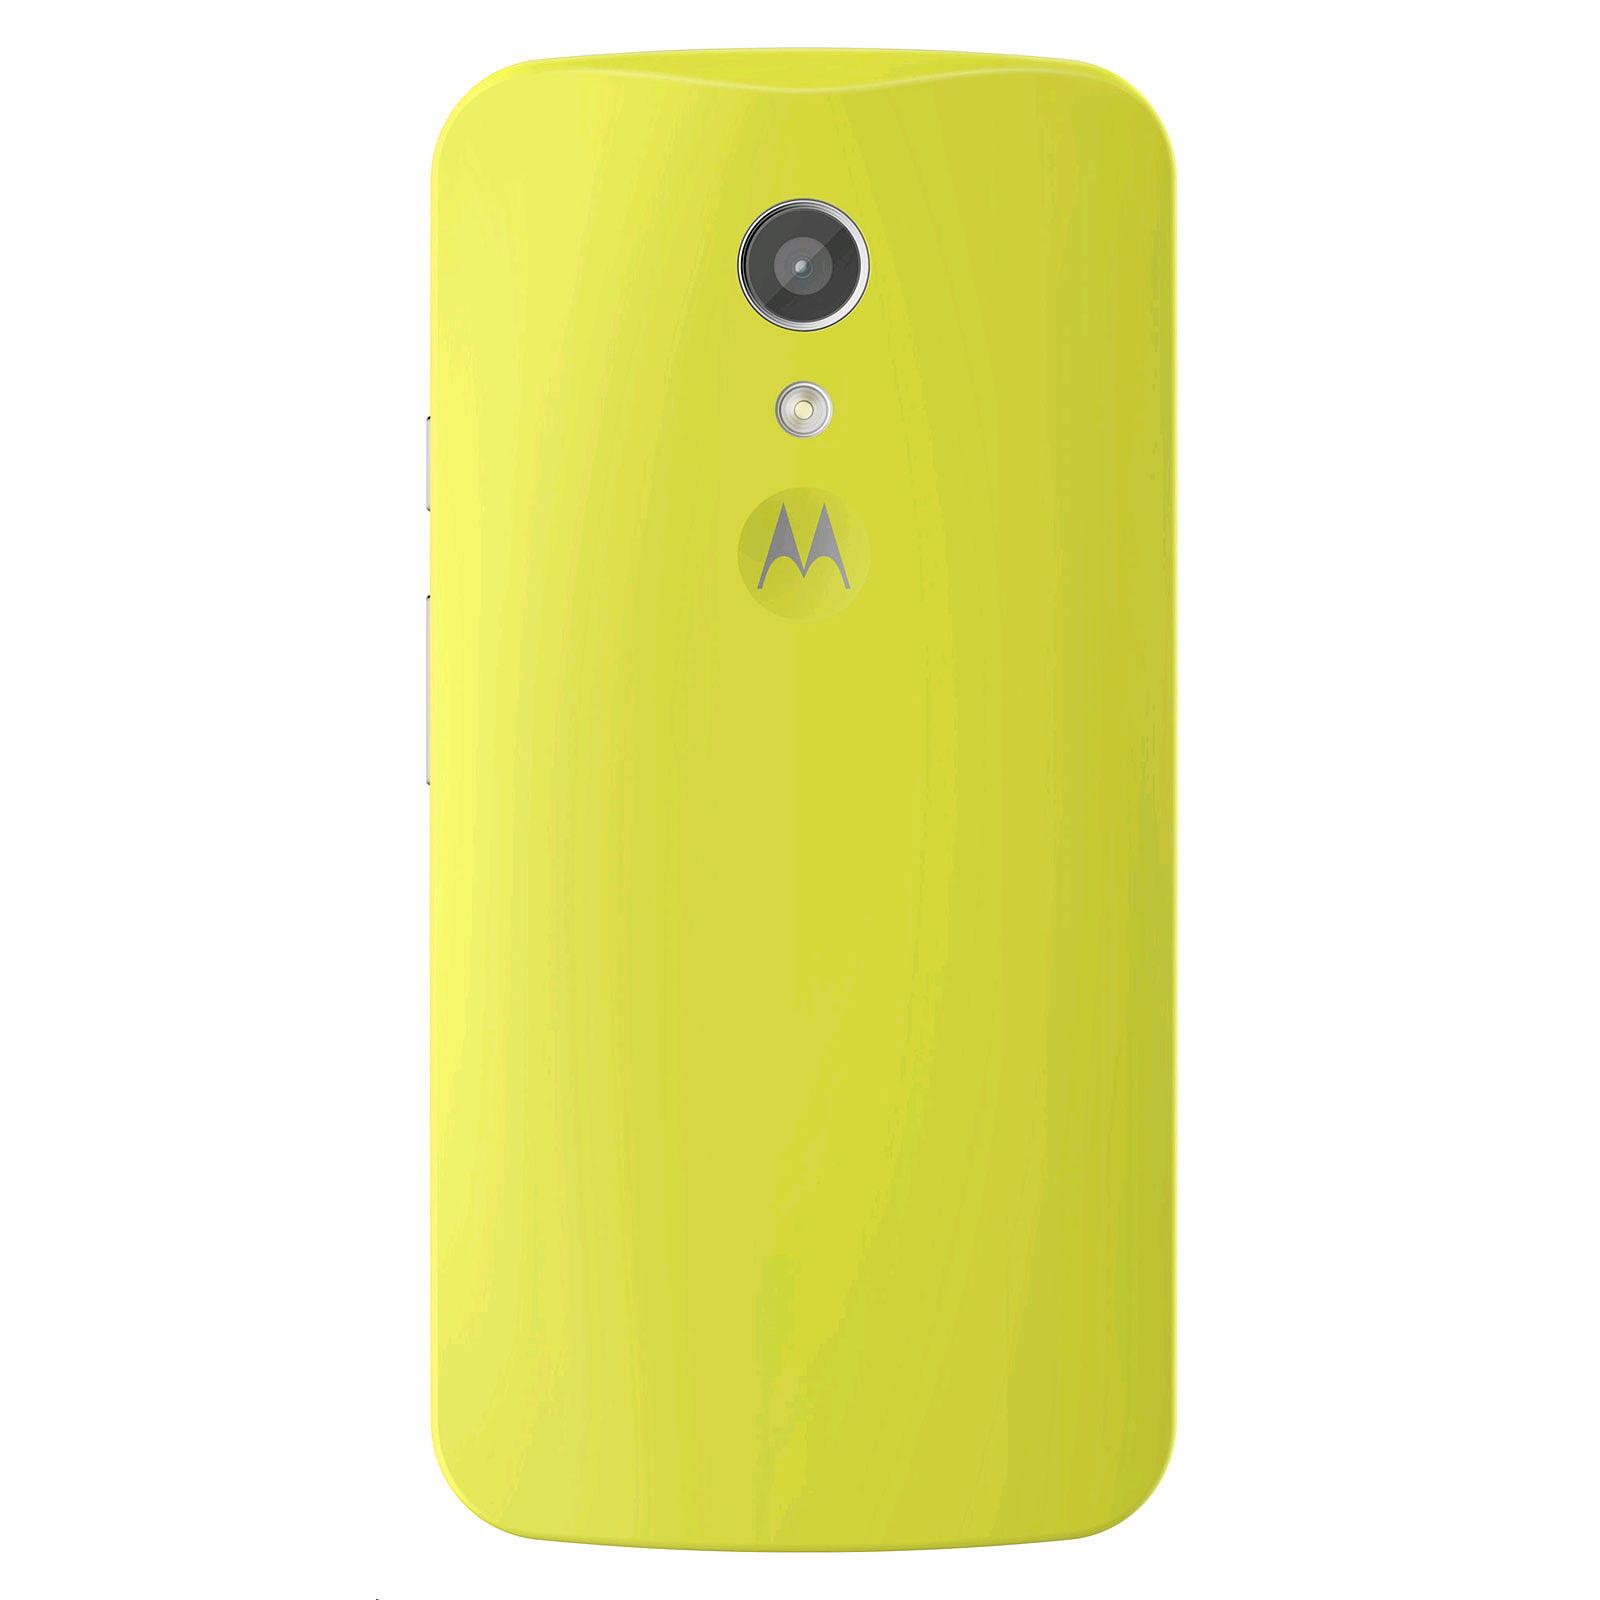 Motorola Coque d'origine Vert Lime Motorola Moto G 2ème Génération